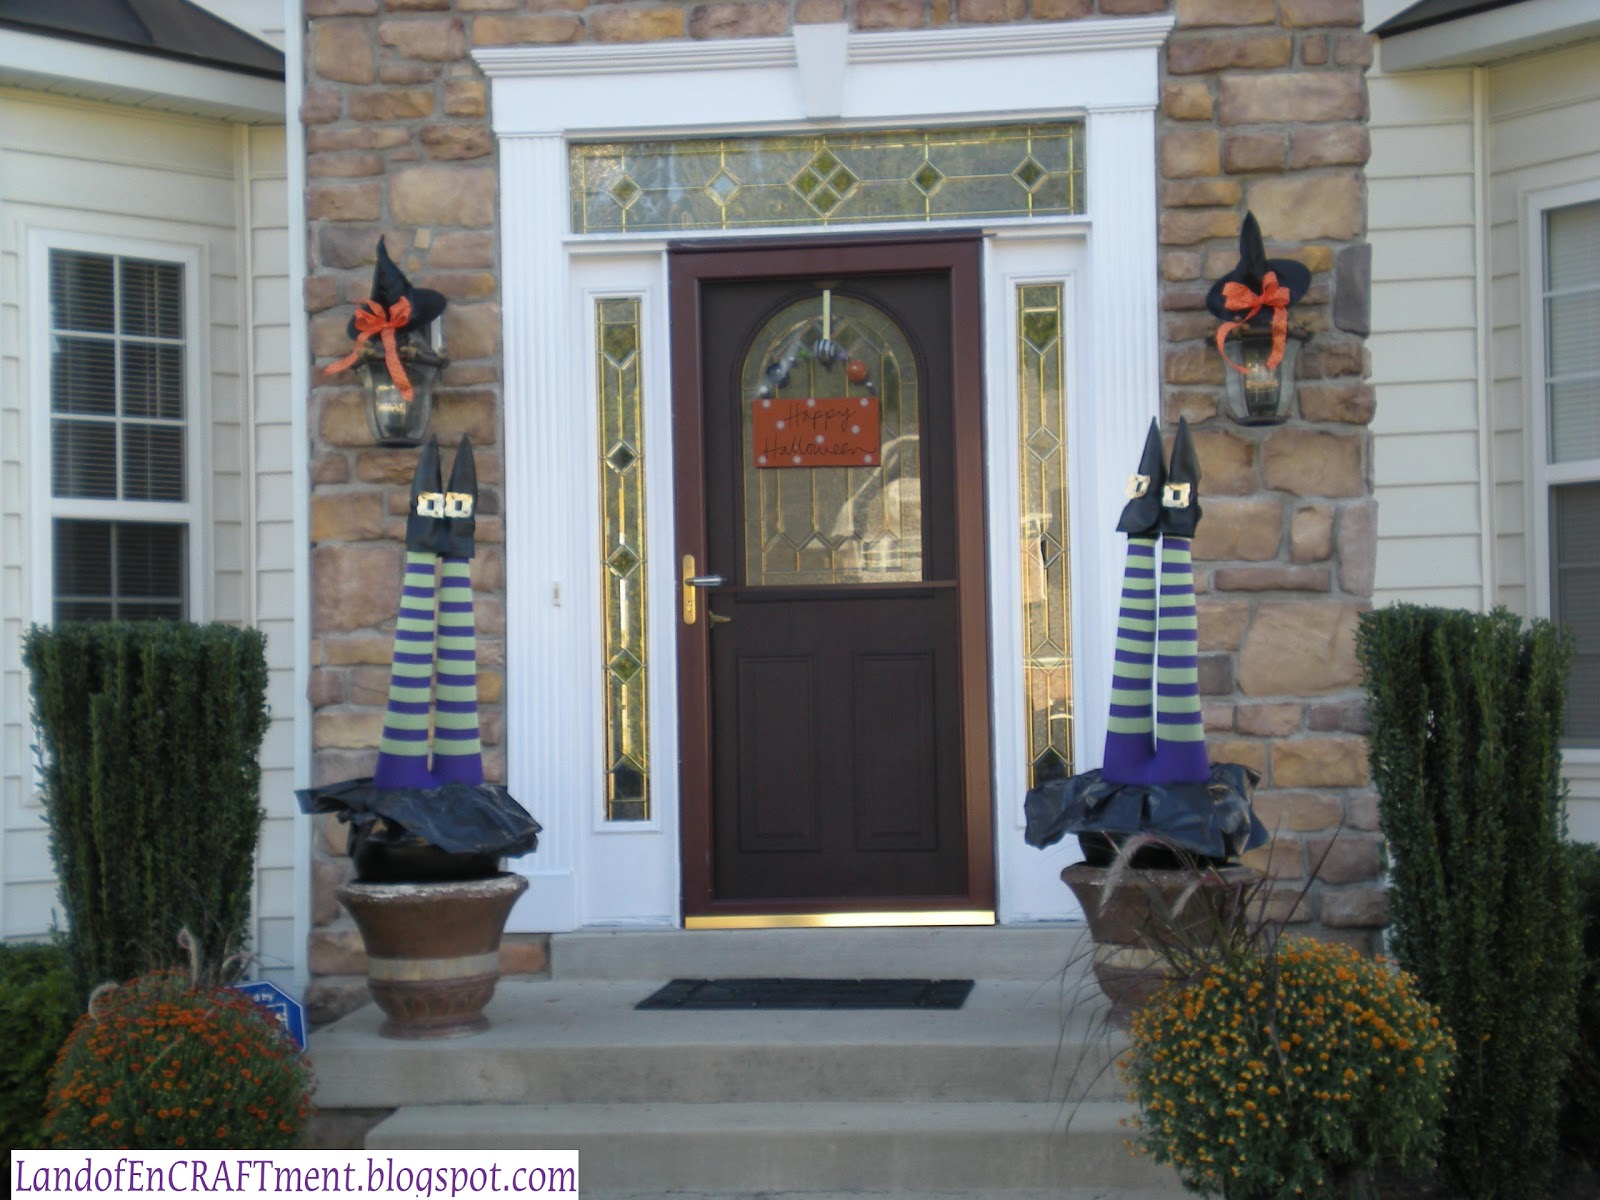 22 fall front porch ideas veranda home stories a to z - Front Porch